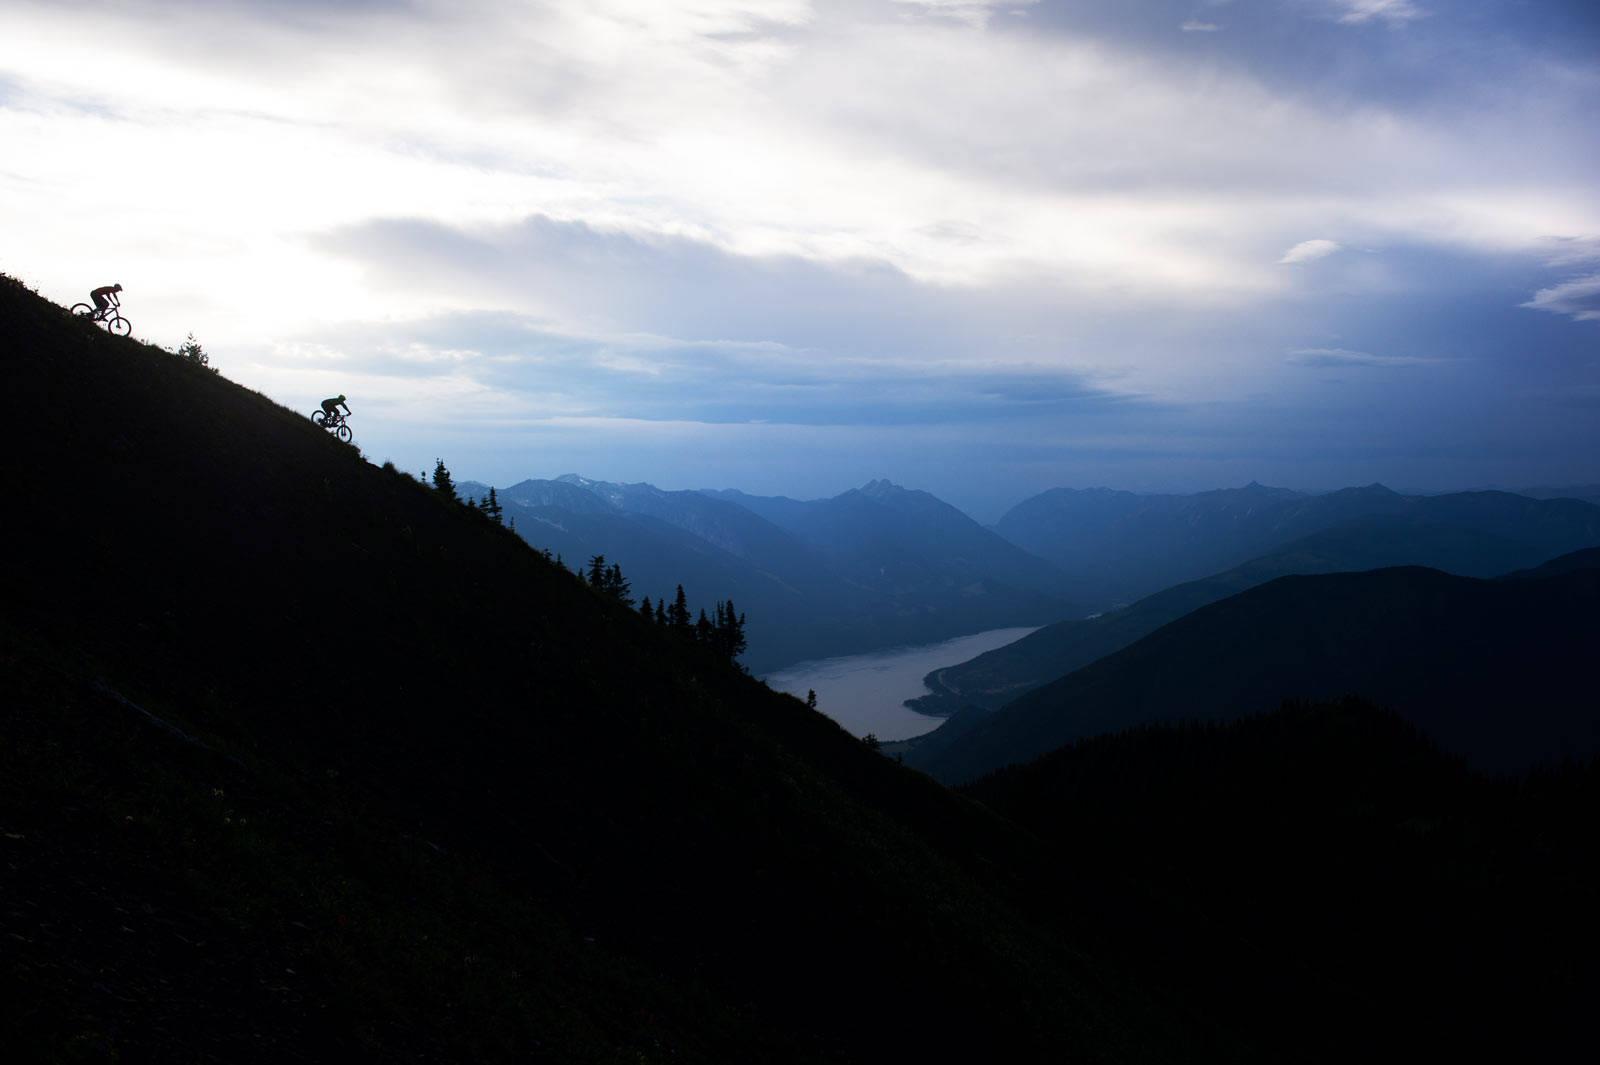 Stisykling-guide-British-Columbia-Nelson-1